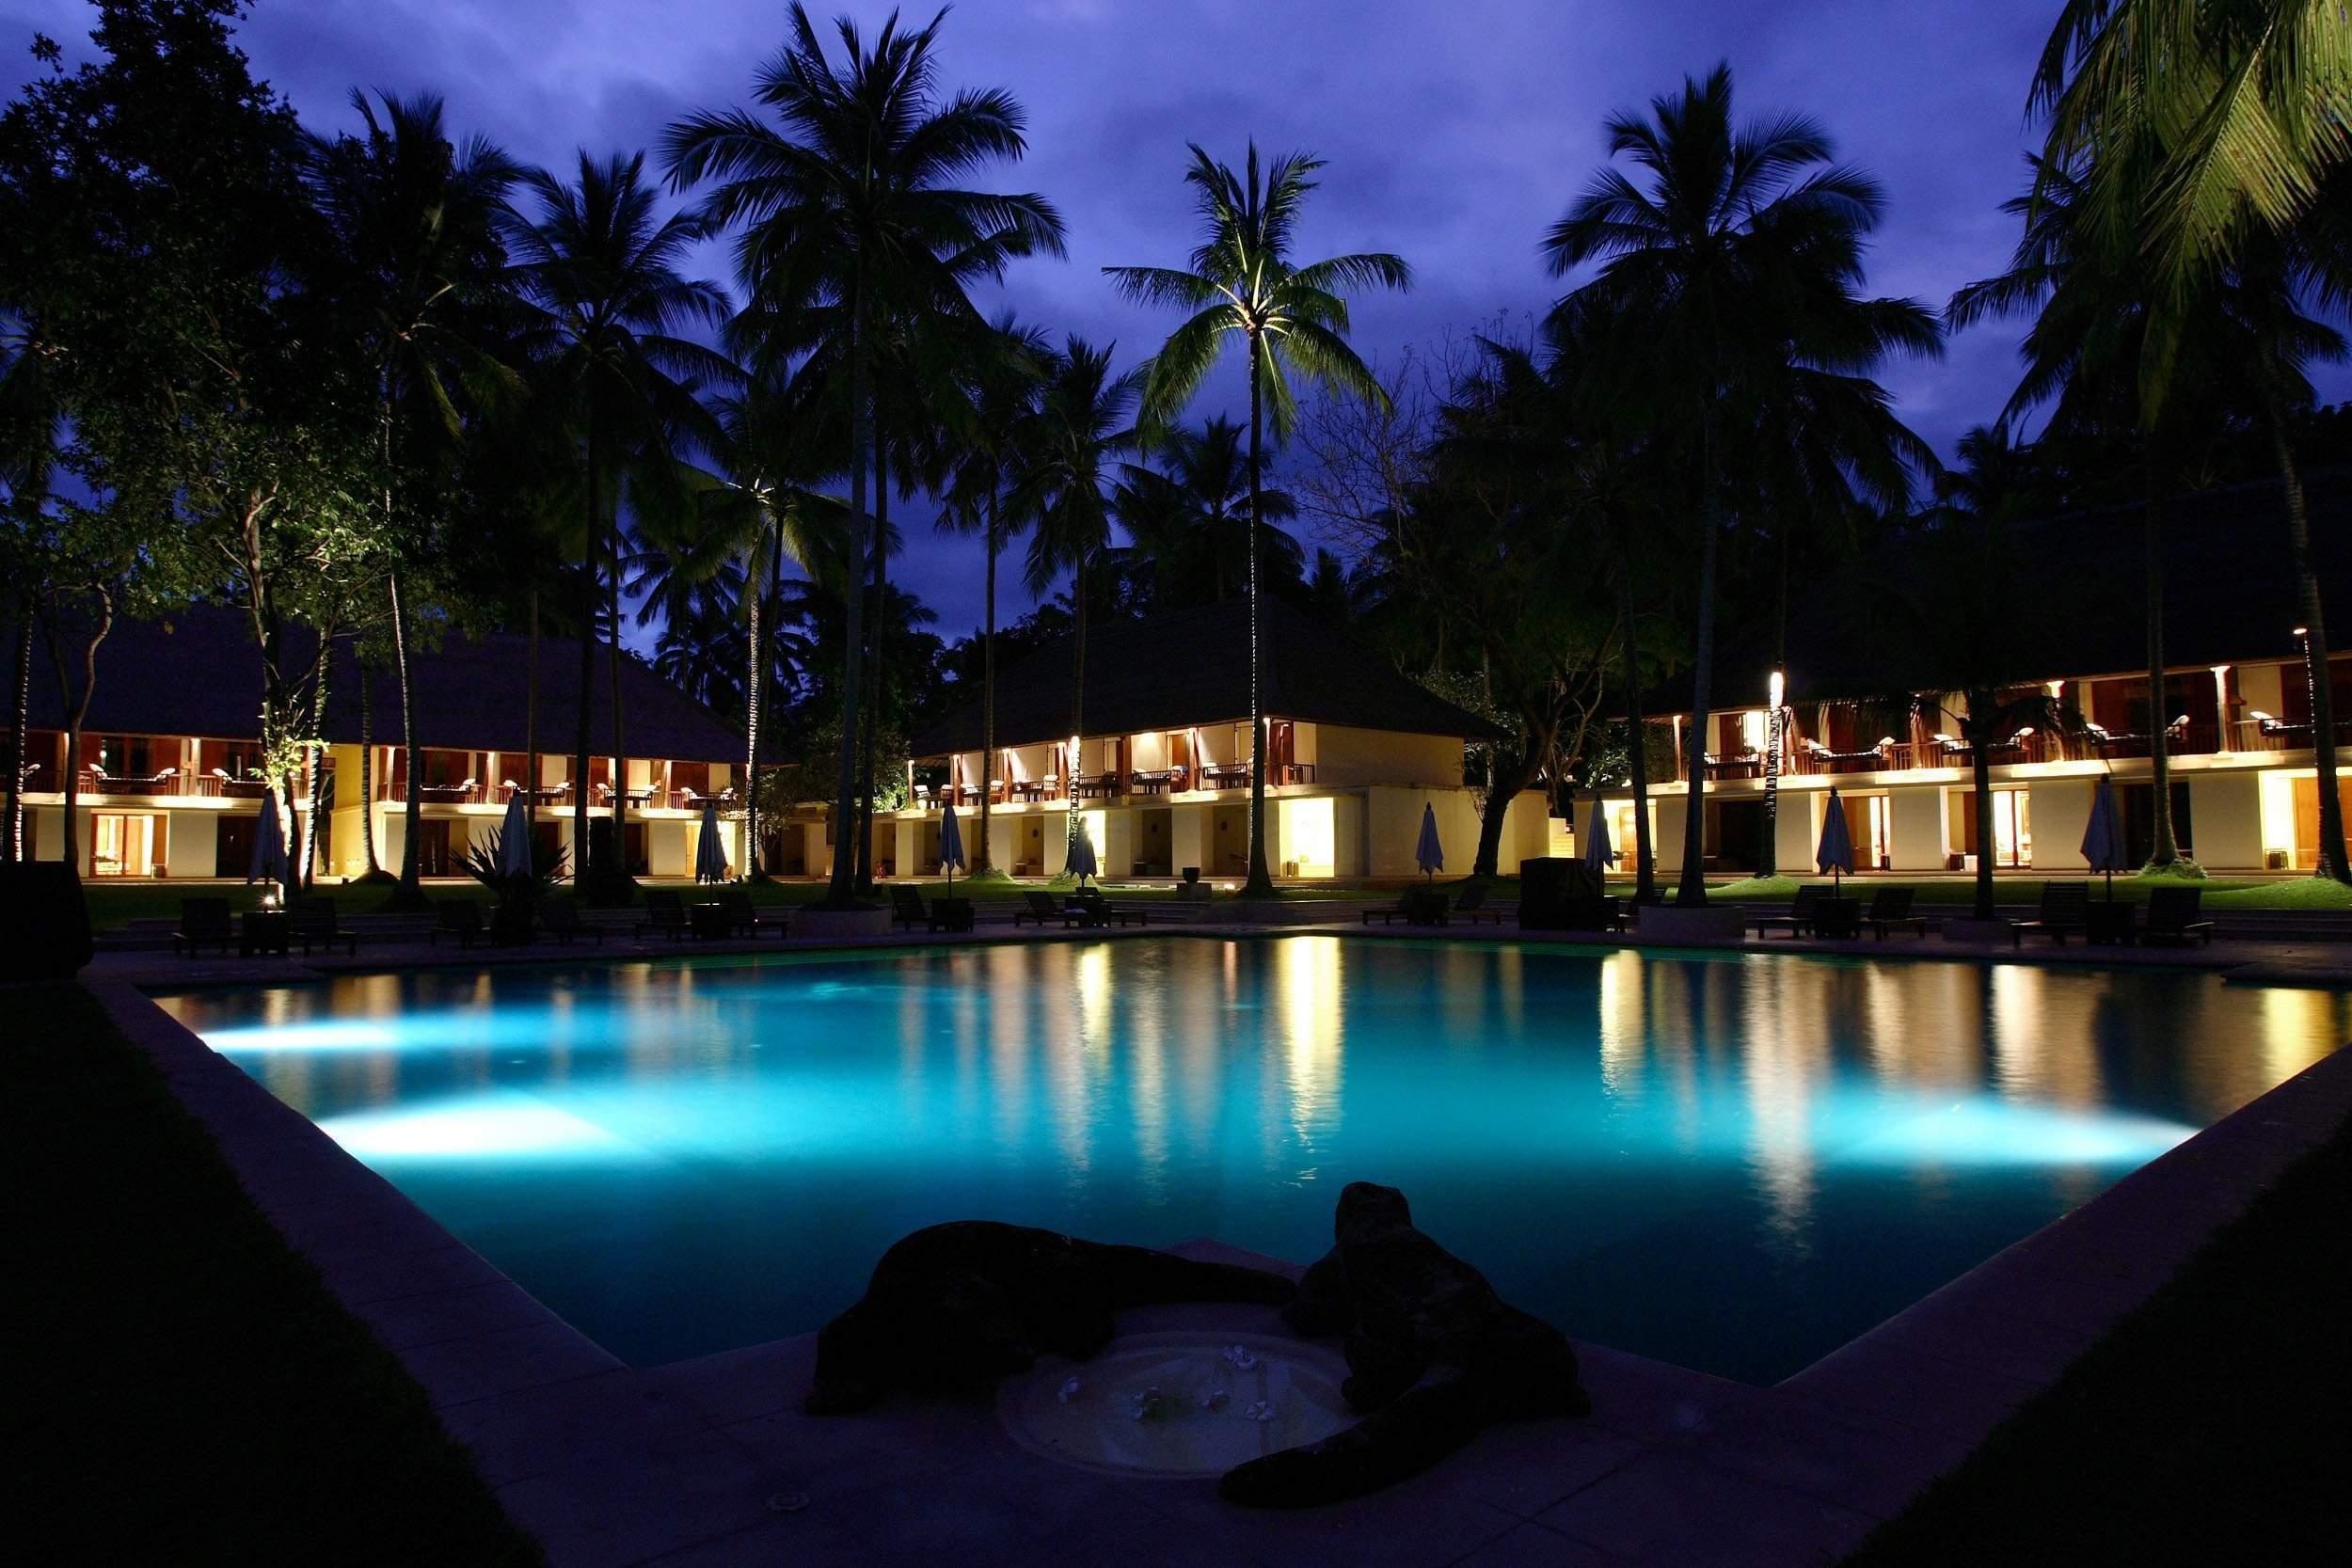 Hotel Alila Manggis